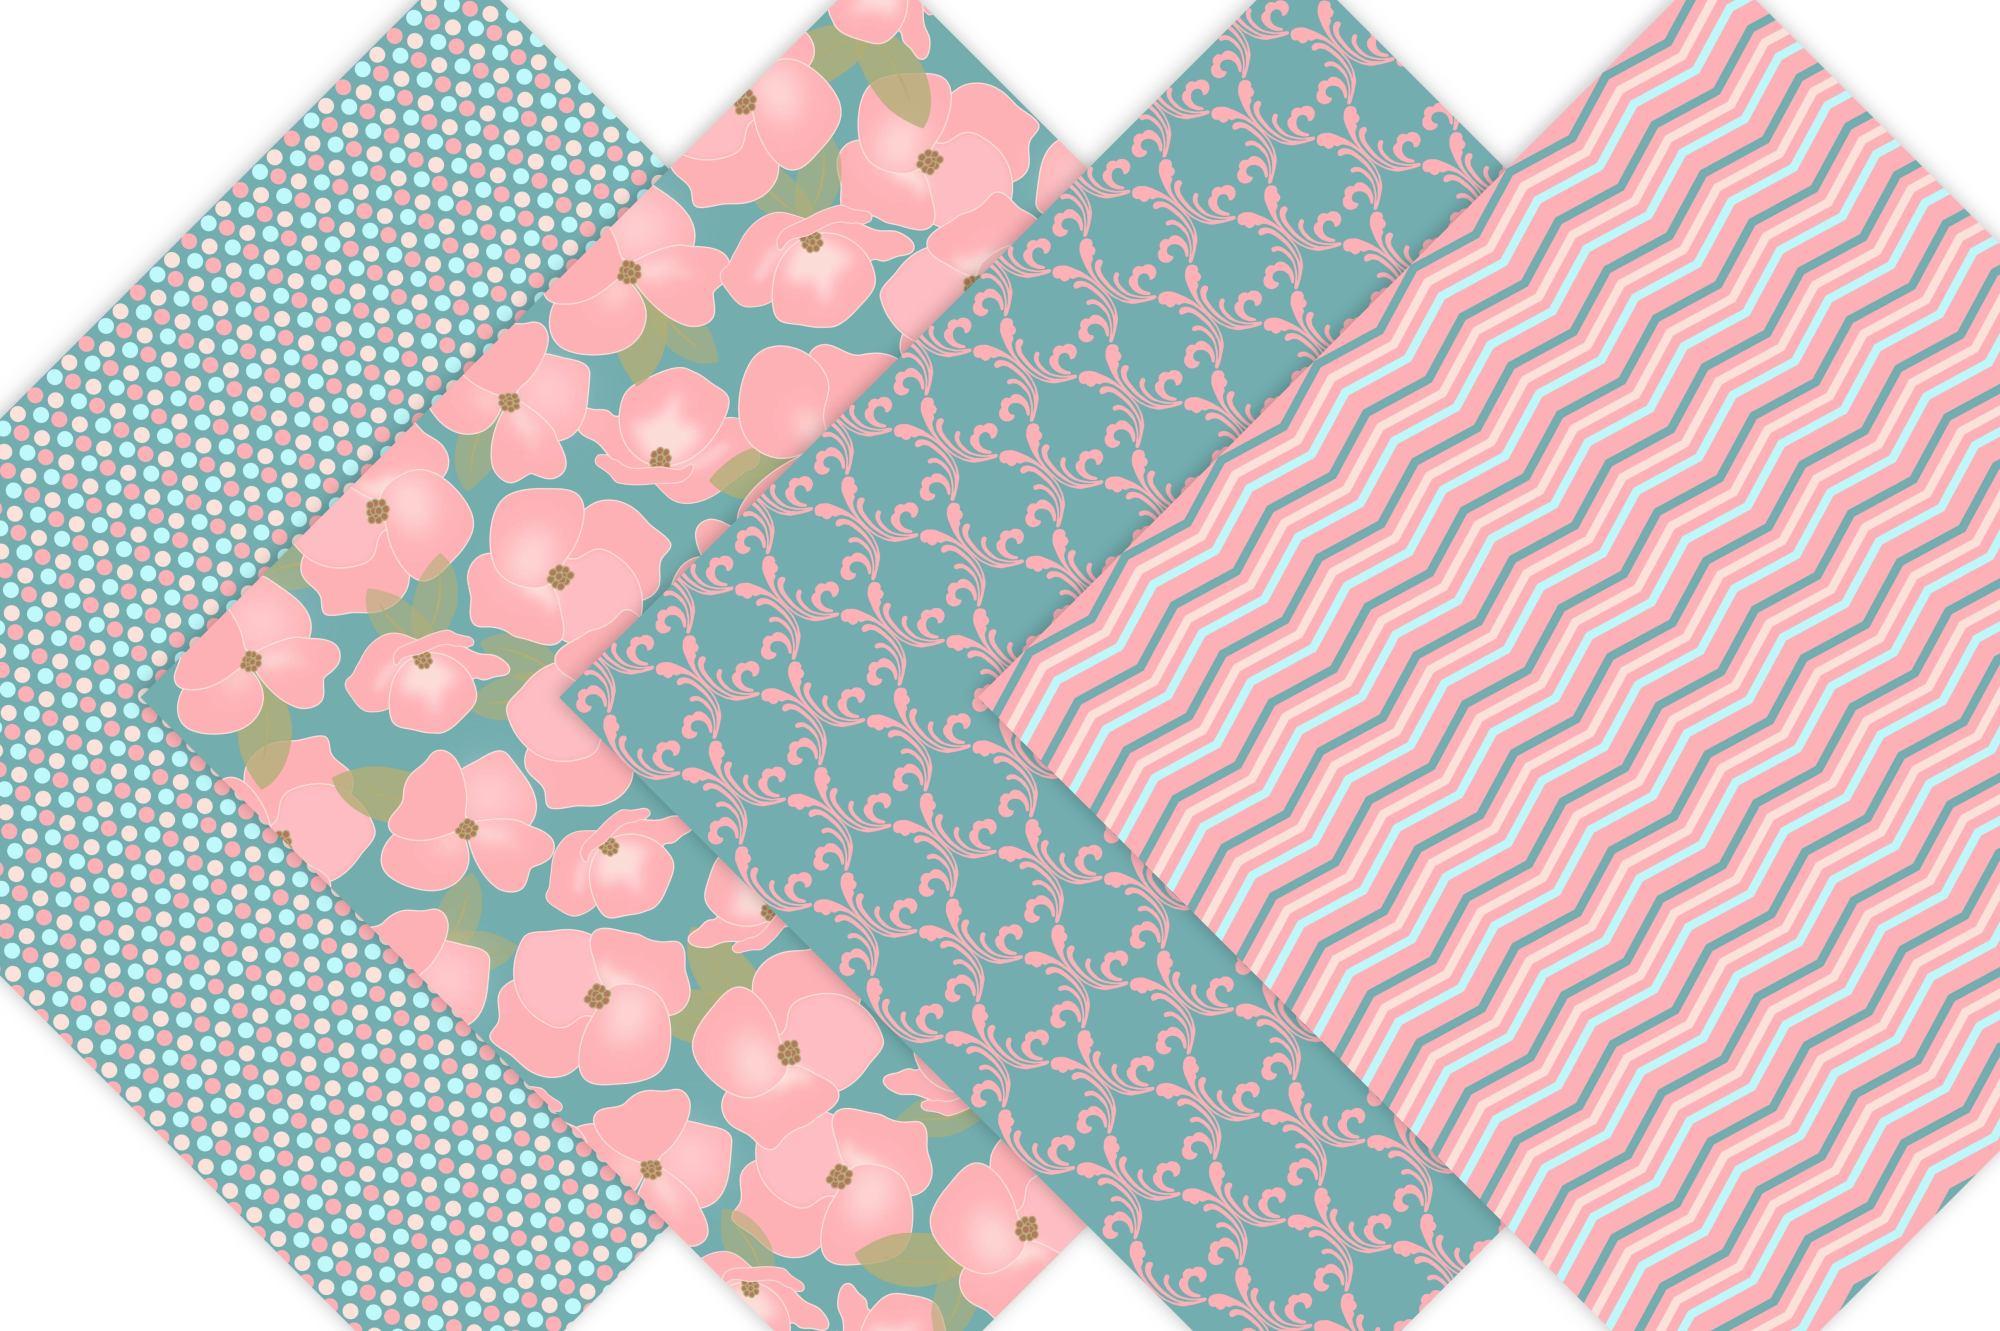 Floral Digital Paper example image 4